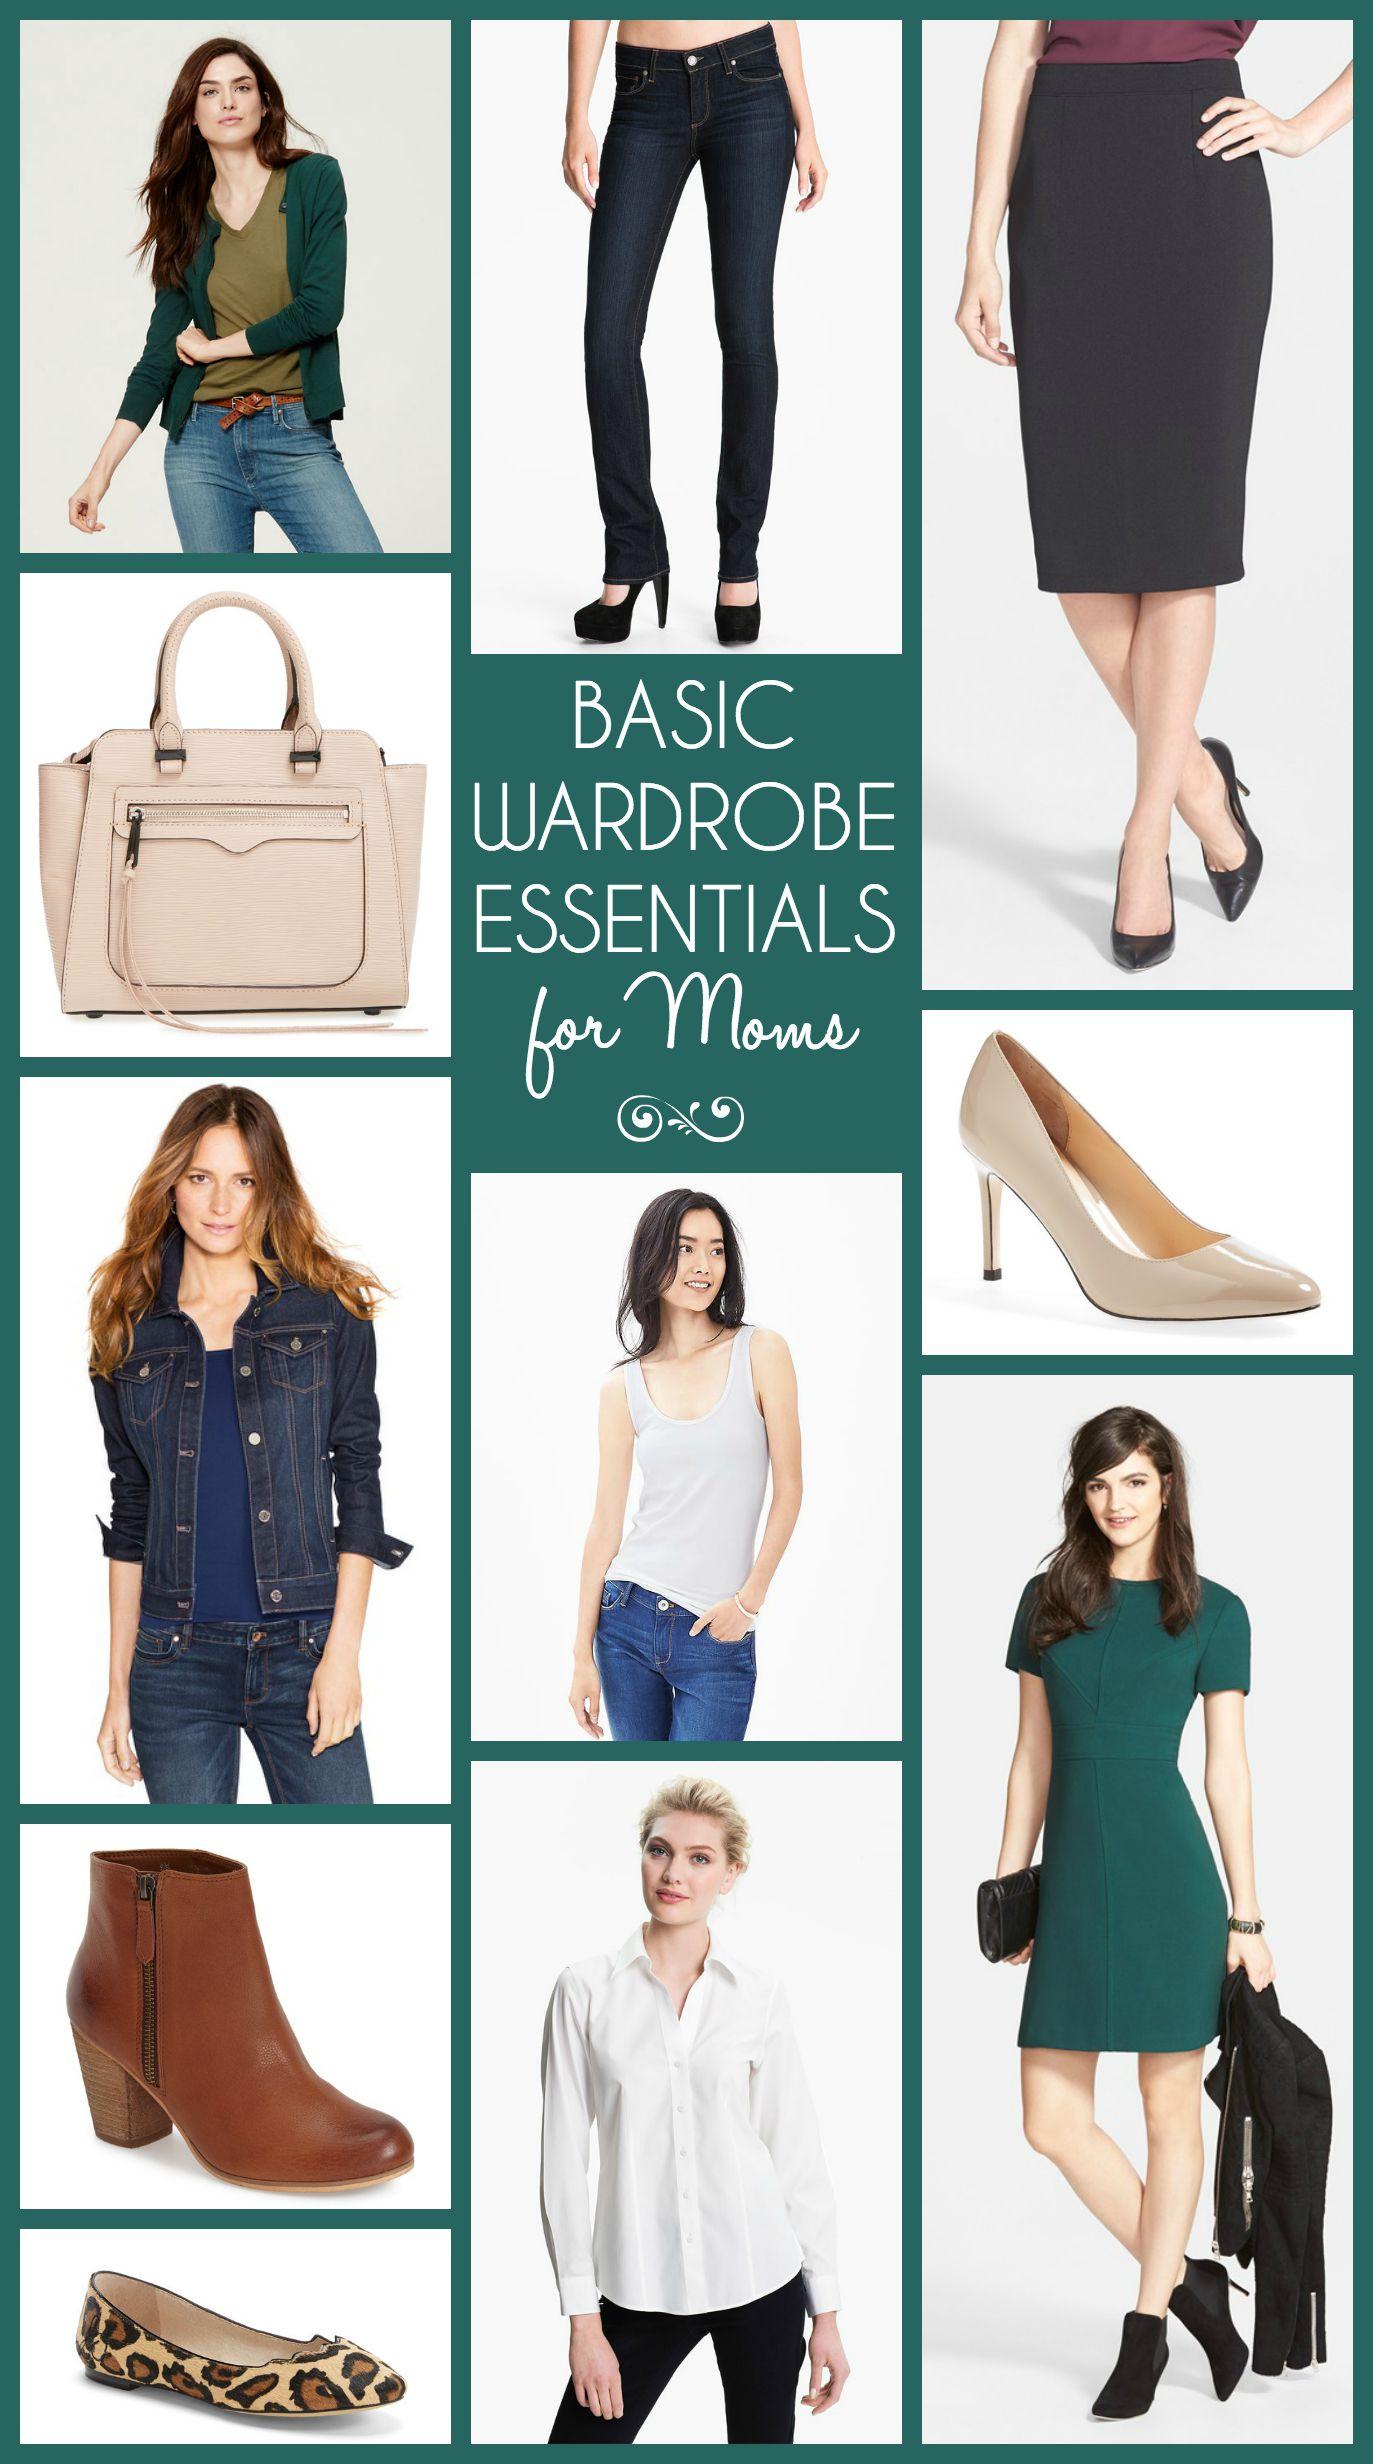 10 Basic Wardrobe Essentials For Moms